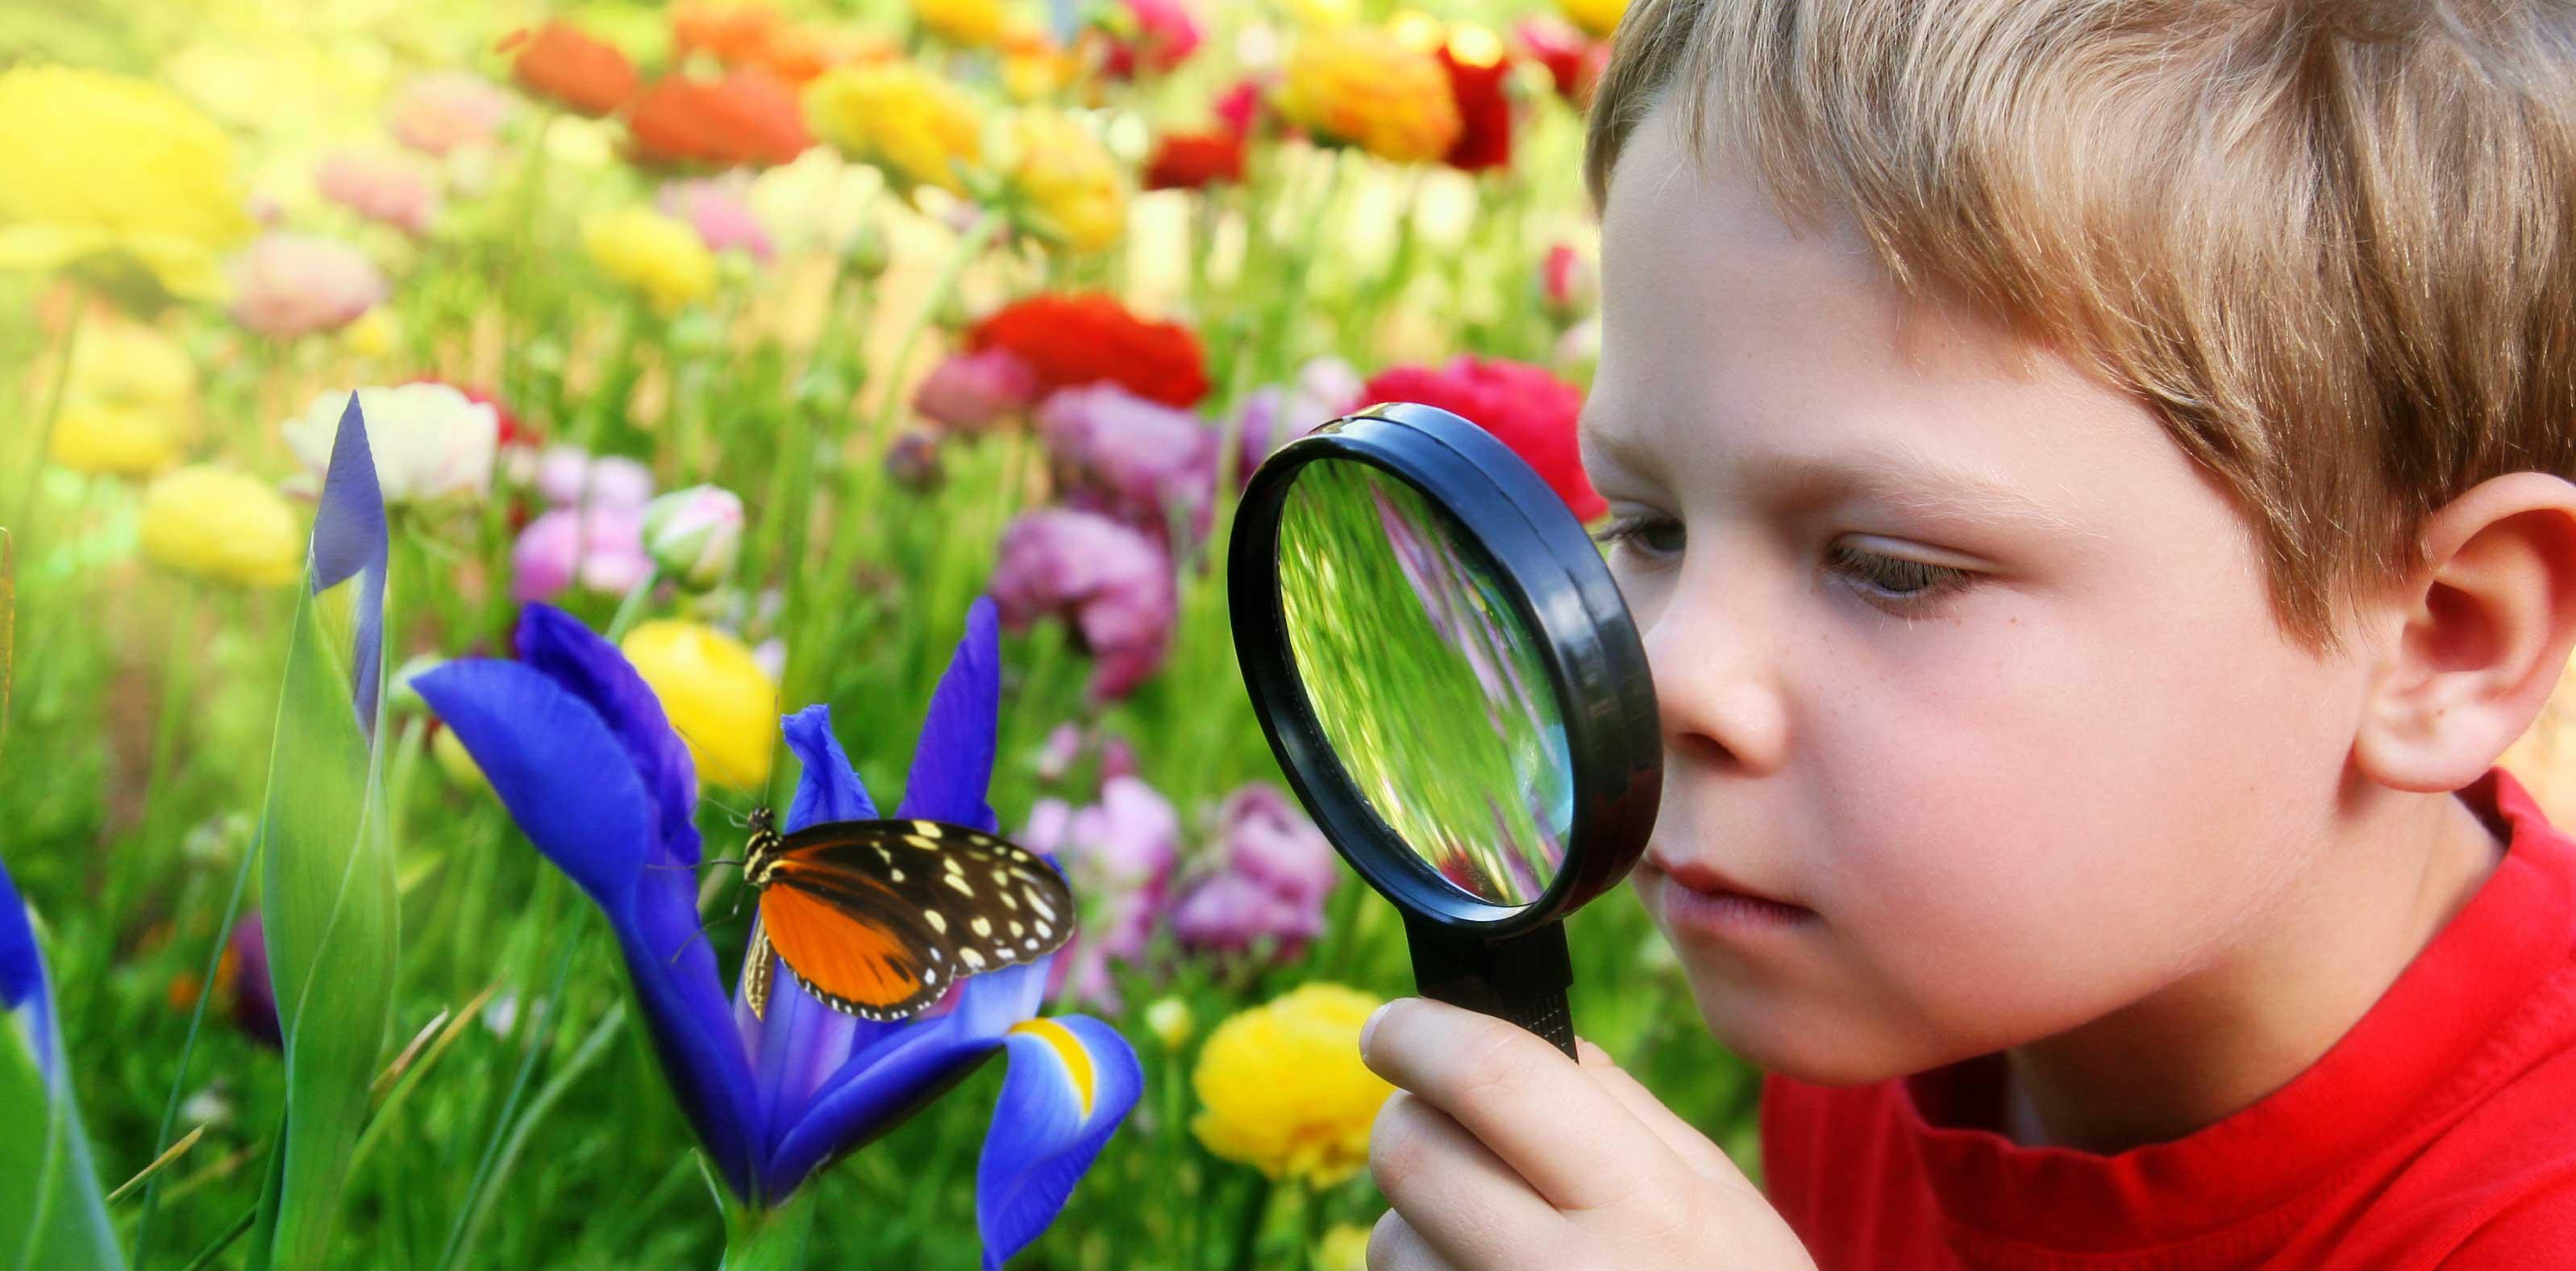 https://vec.com.ua/wp-content/uploads/2015/02/boy_magnifyingglass_900.jpg